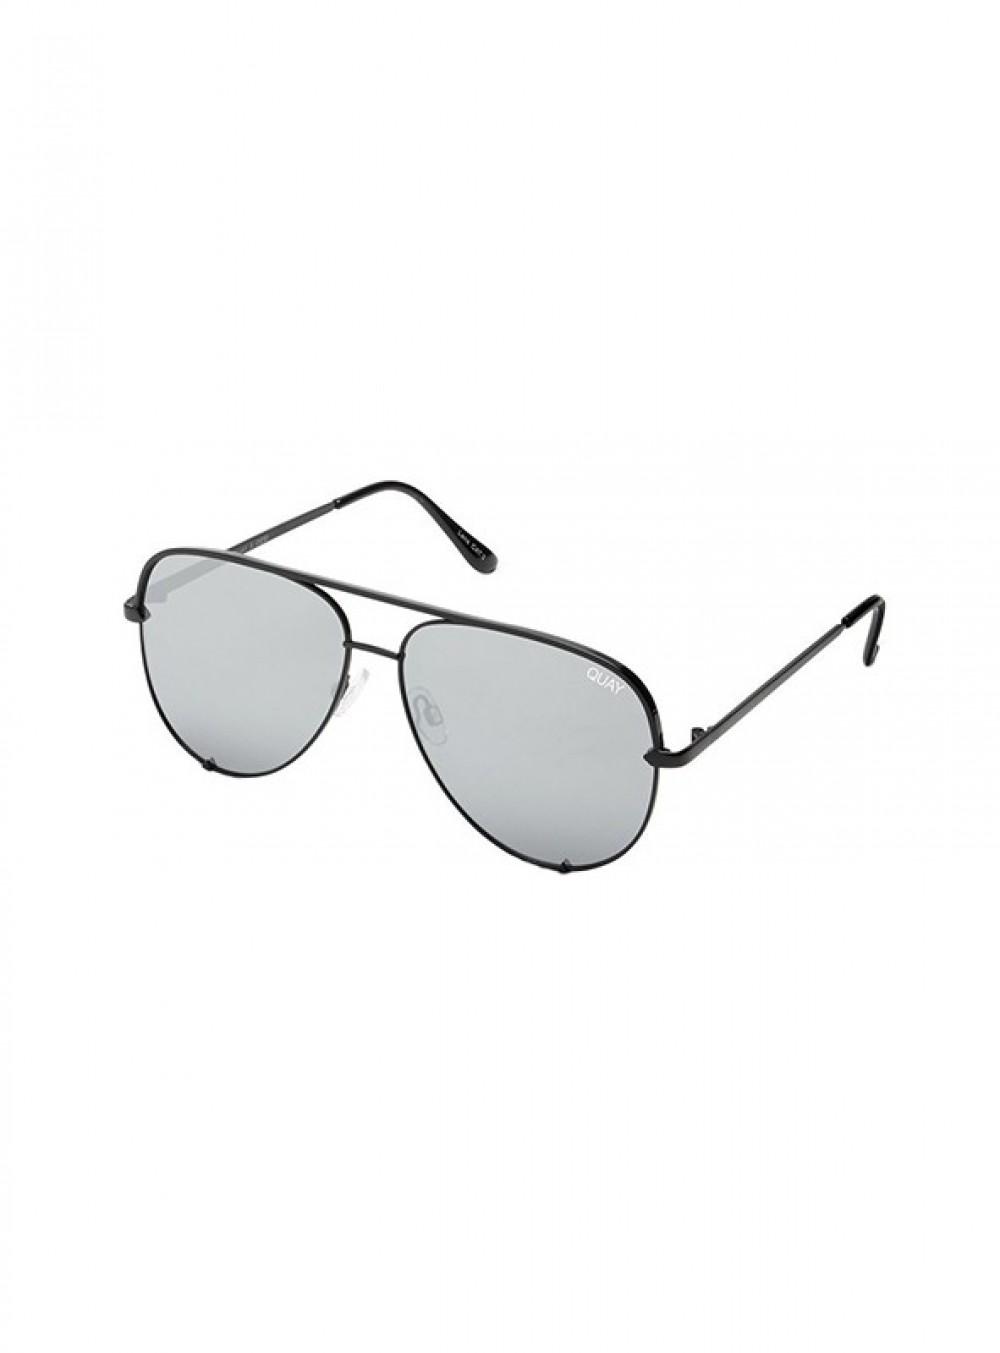 22739b76b2d 1000x1353 Quay X Desi High Key Mini Sunglasses Blacksilver